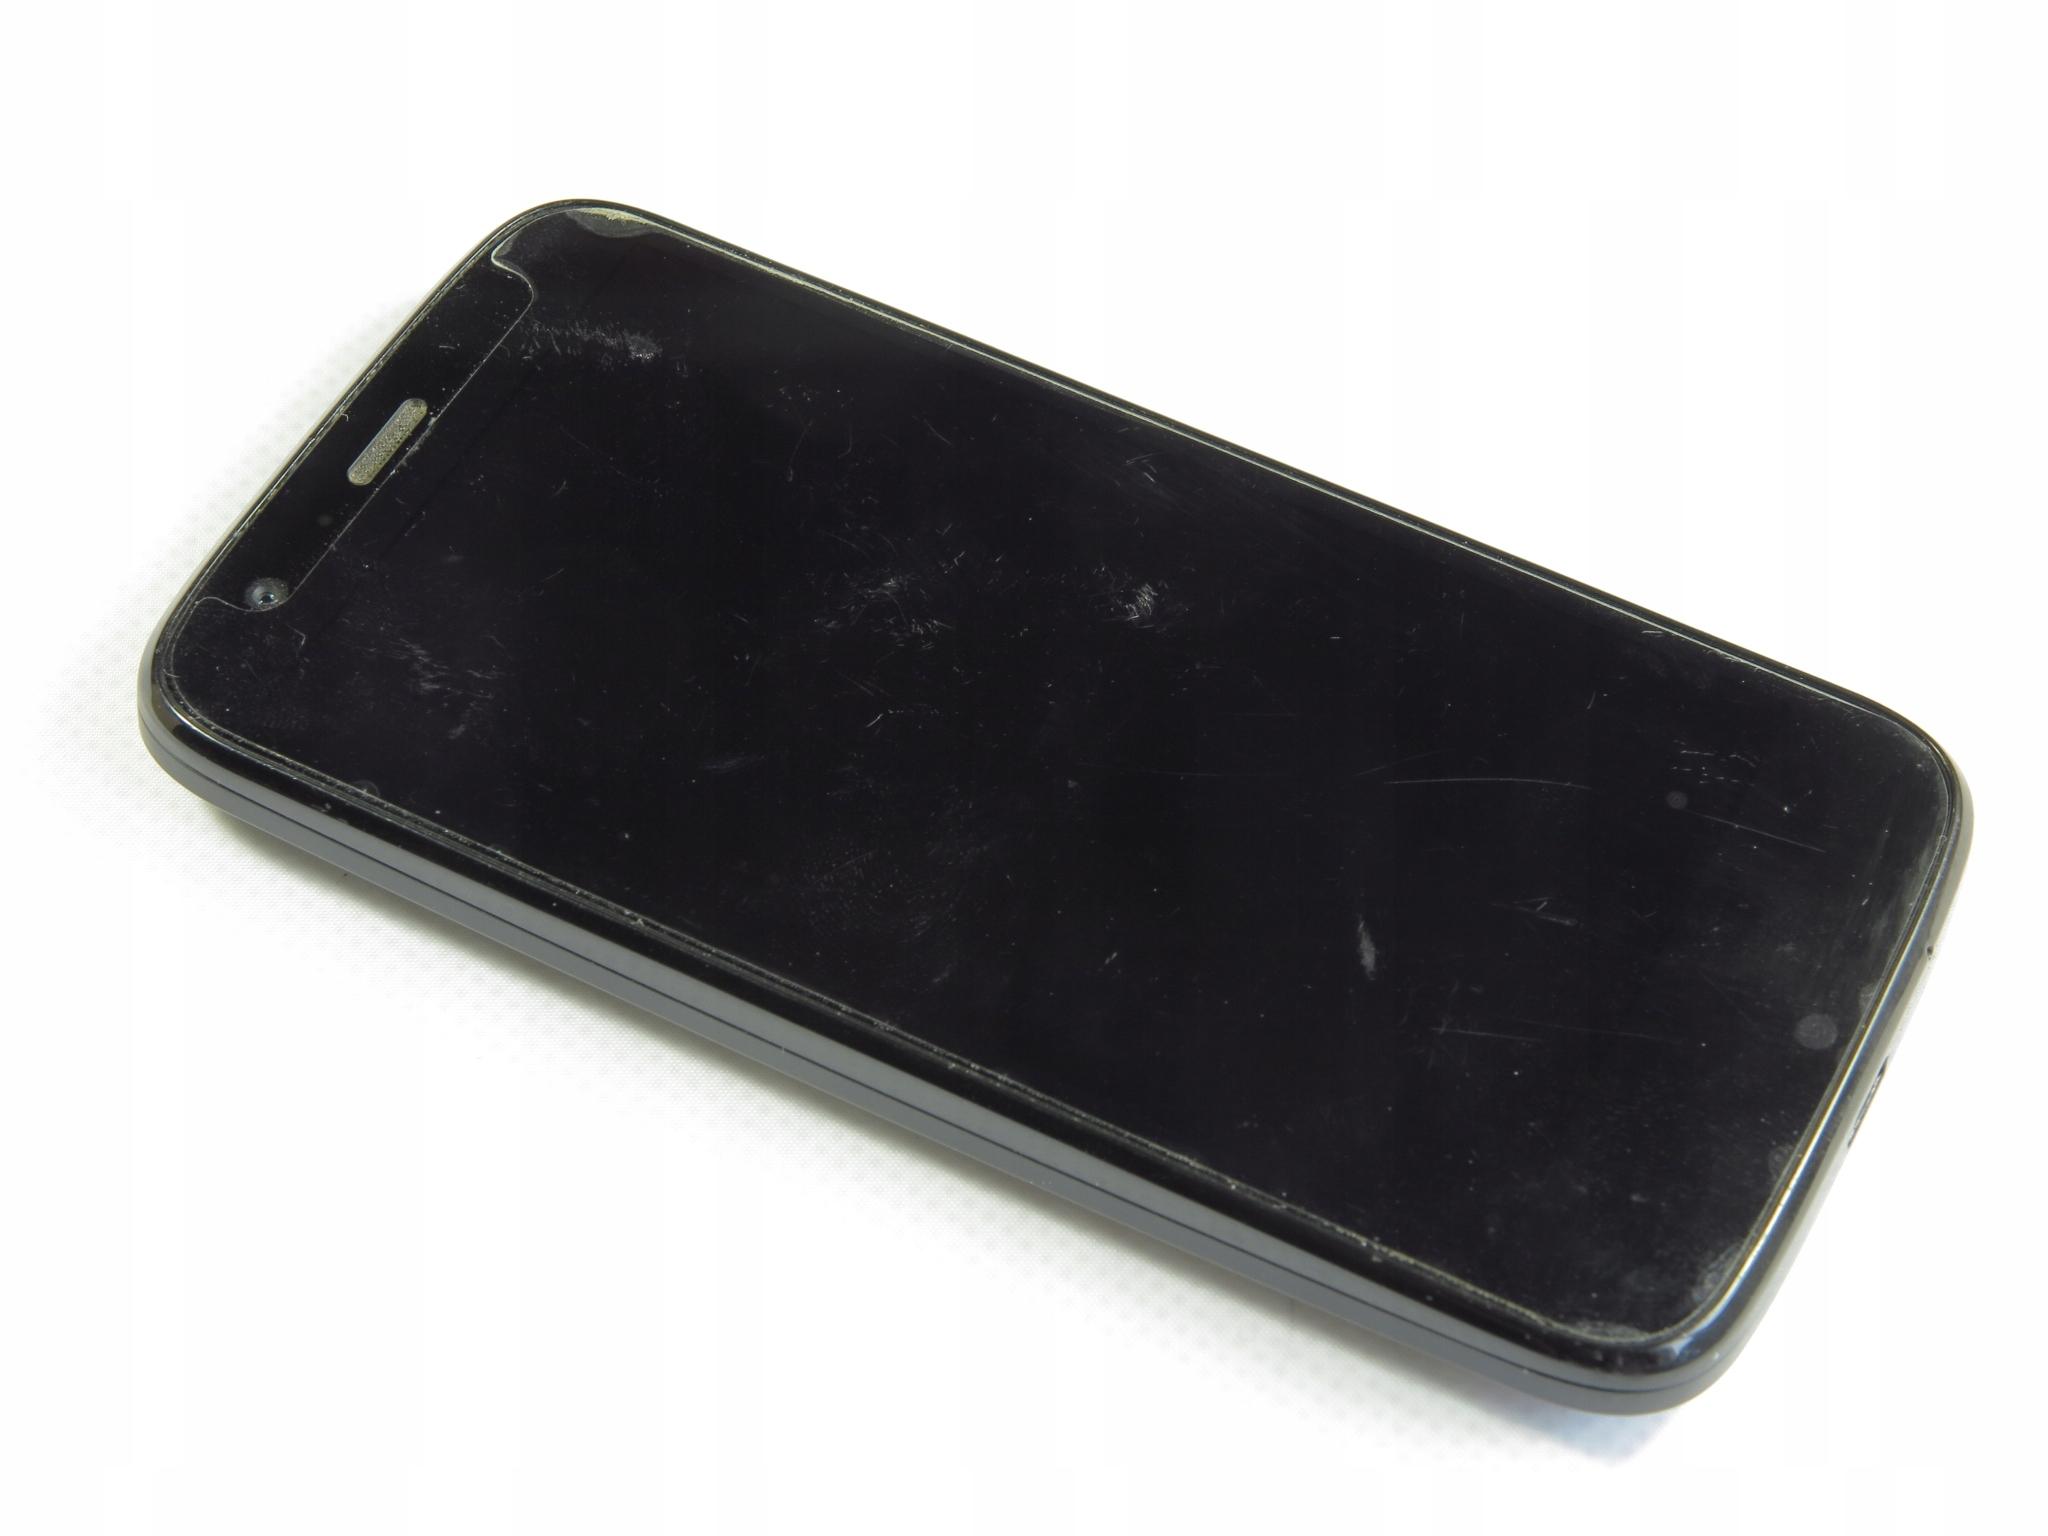 Motorola Moto G Dual Sim XT-1033 android 9 Pie BCM